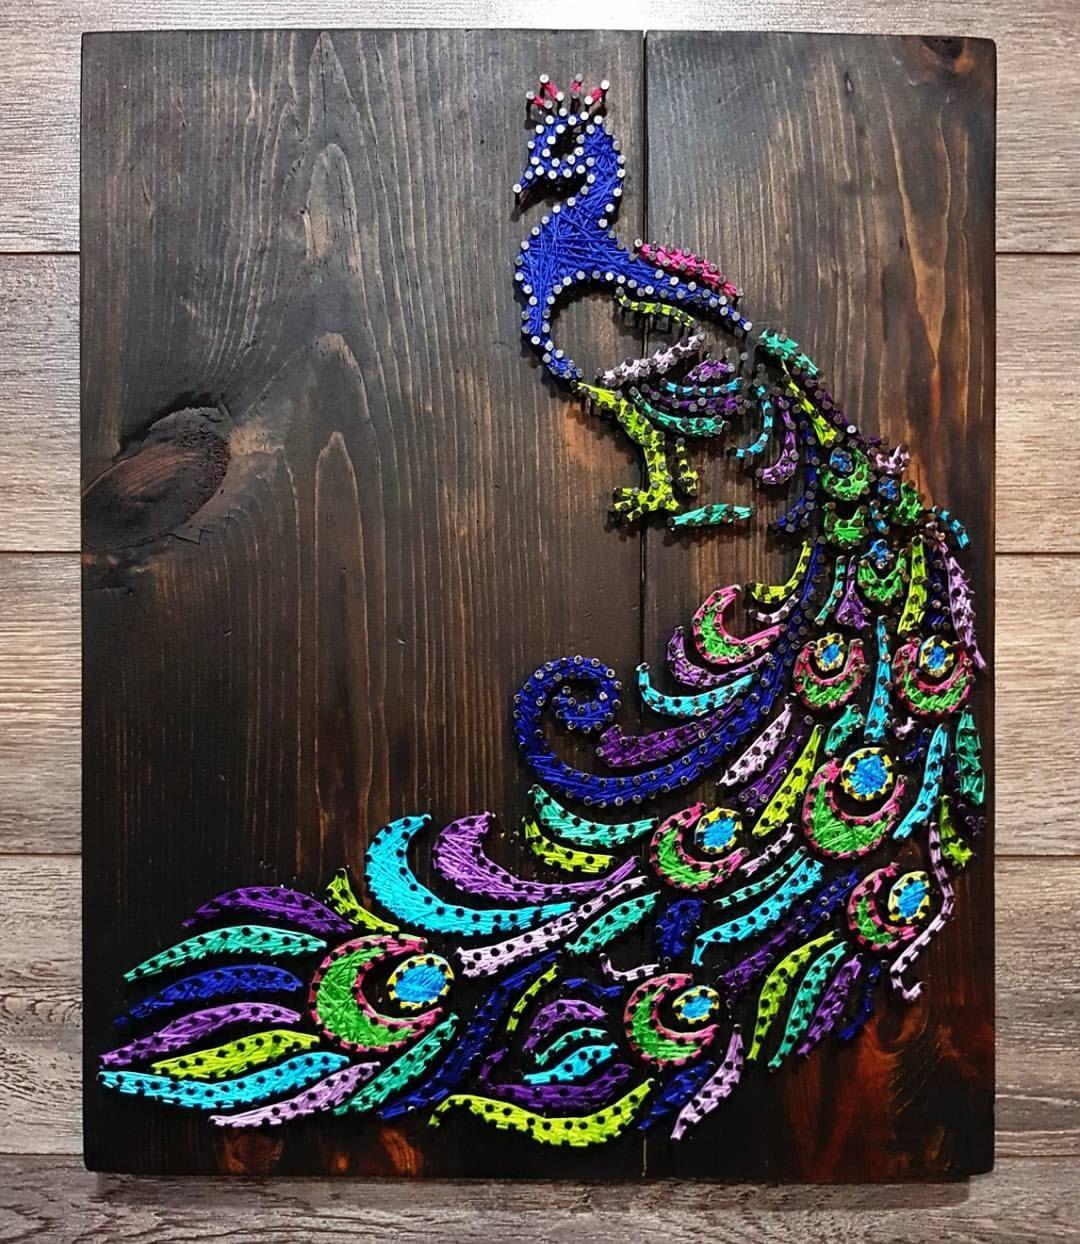 "Photo of Walnut Bank Designs on Instagram: ""Peacock 💜 #newlove #dreamcatchersbykelsie #sunflower #tractor #spring #stringart #crafts #summer #barnboard #handmade #homedecor # country…"""